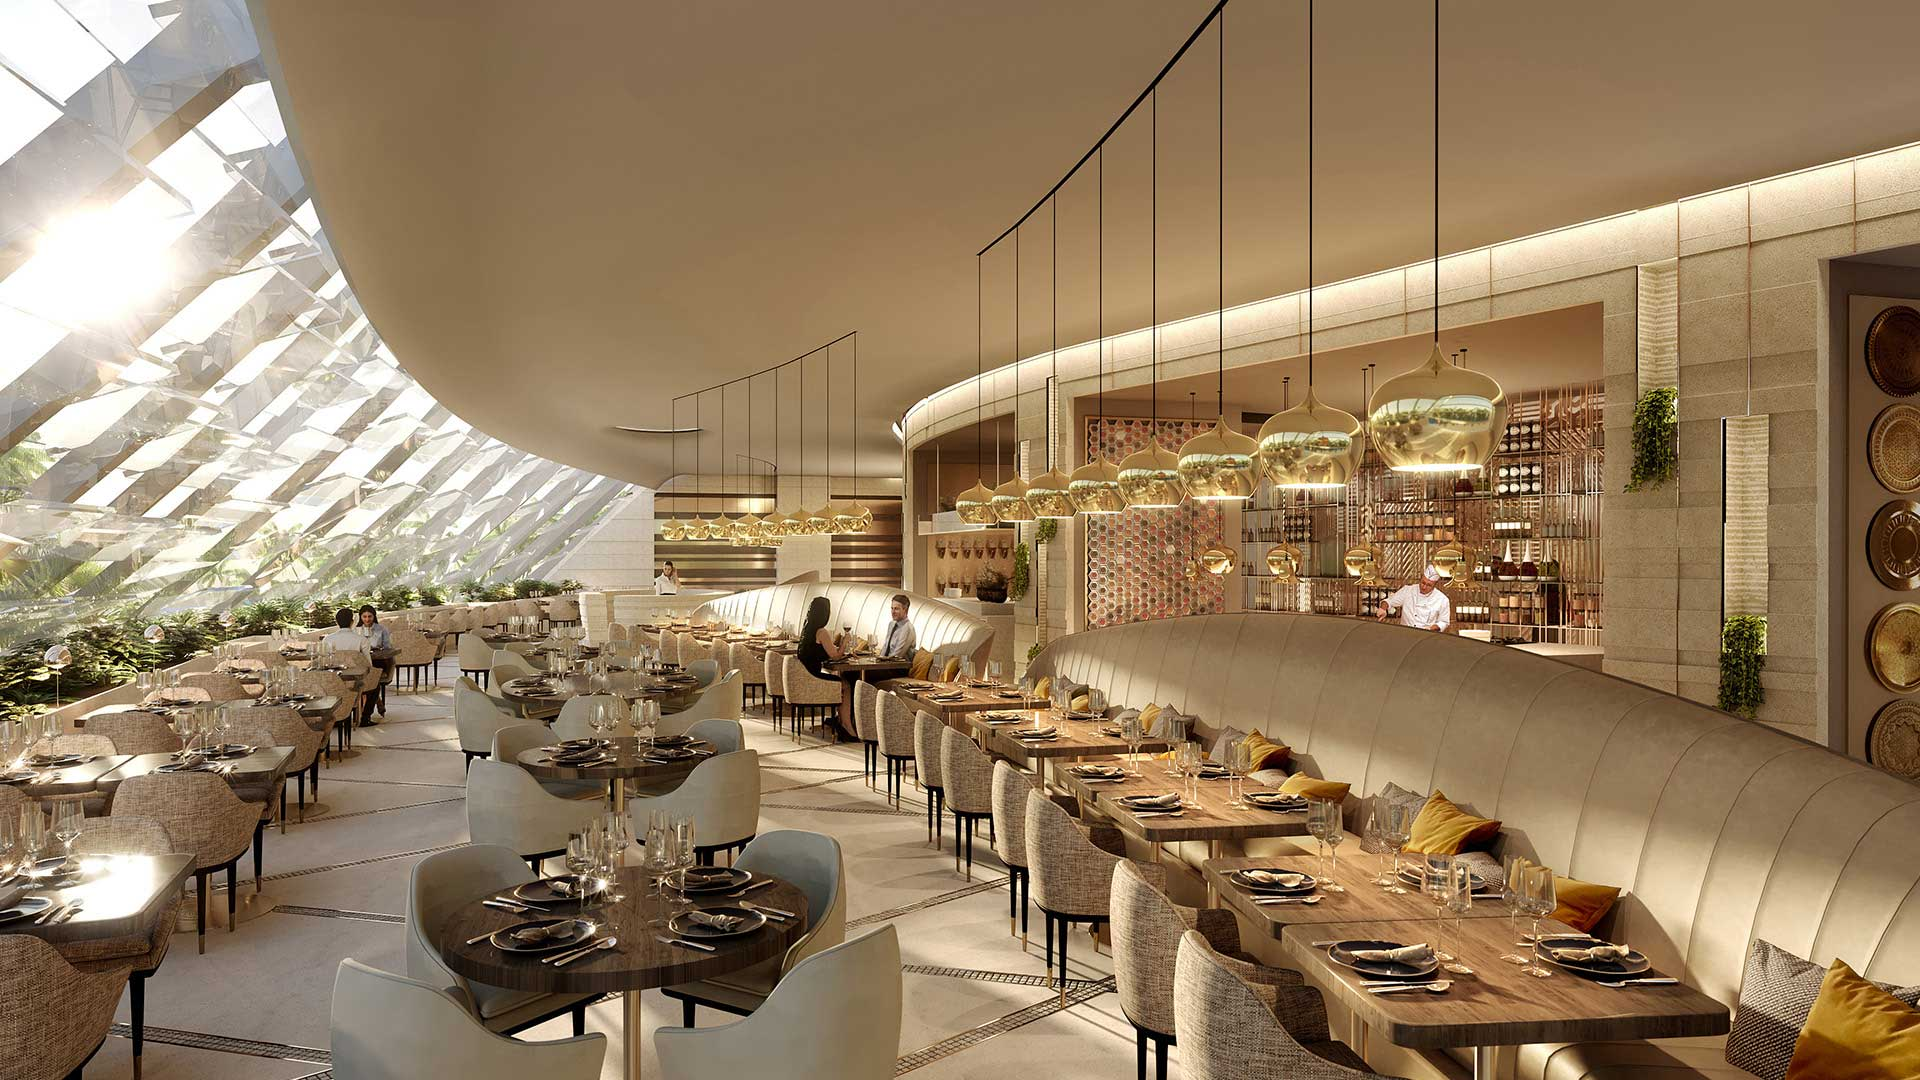 3D Photo Perspective Restaurant Studio 3D Creation